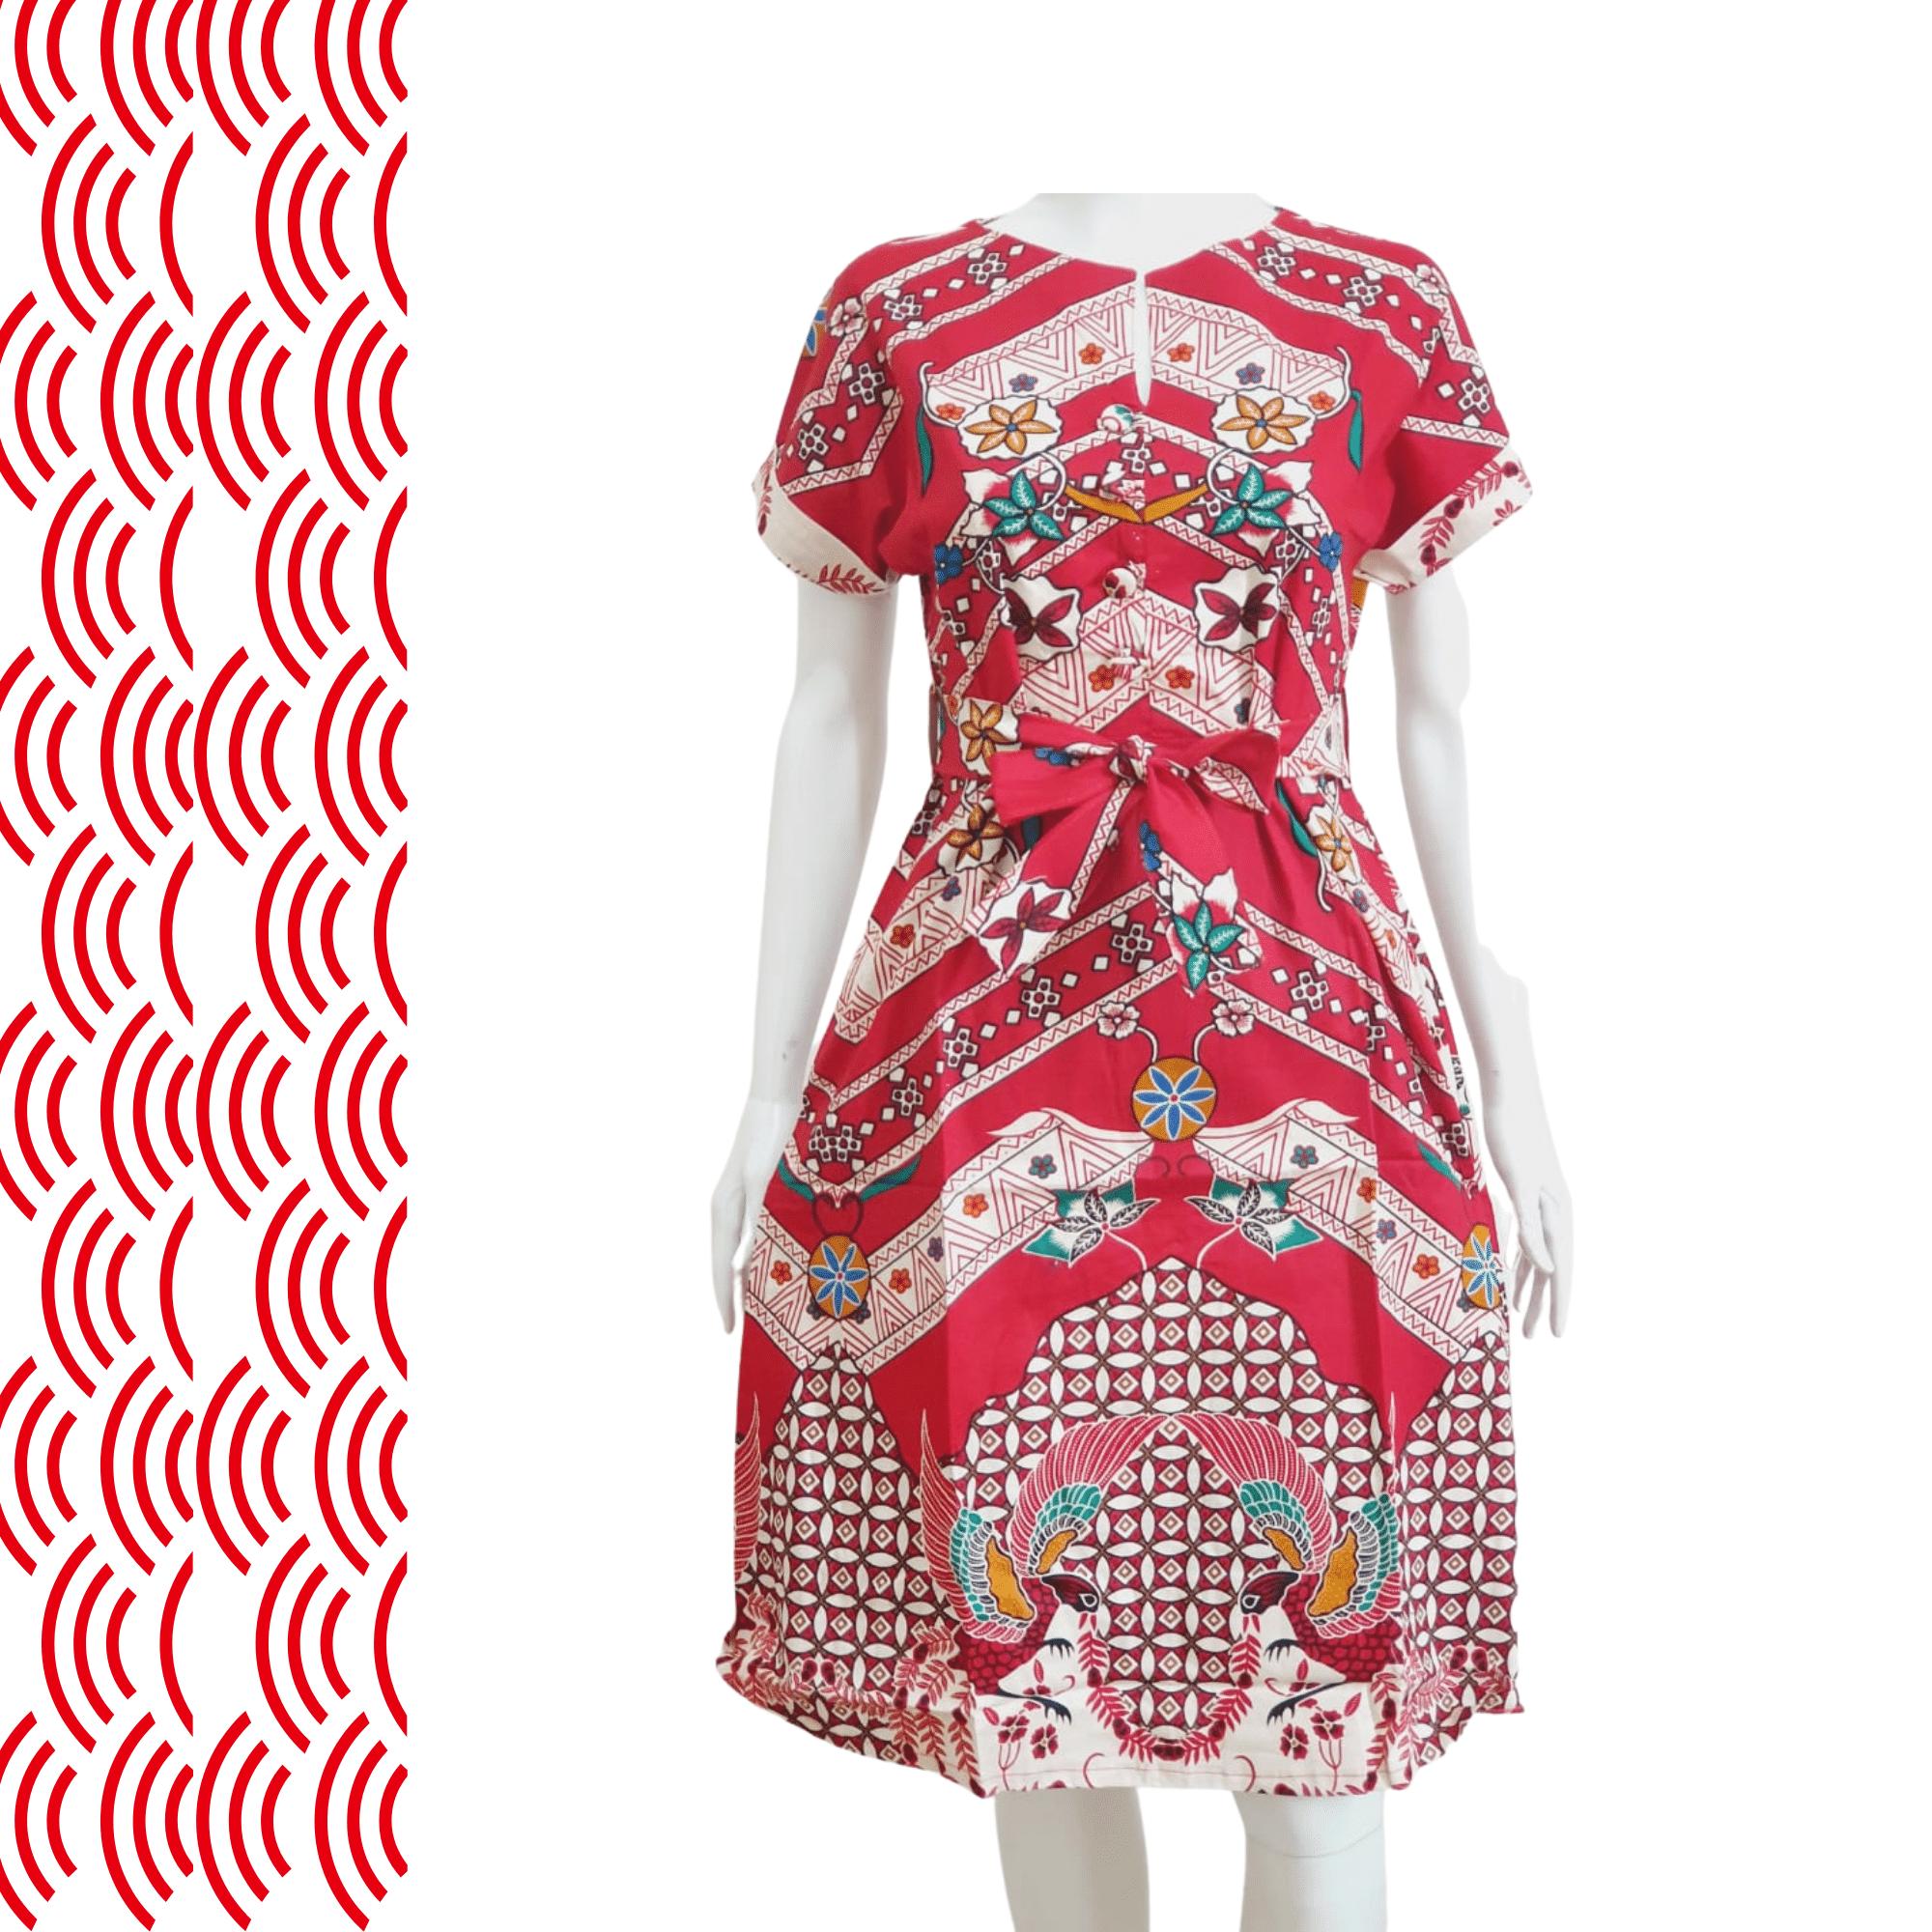 Cheongsam Batik Red Dress Sleeveless 723B